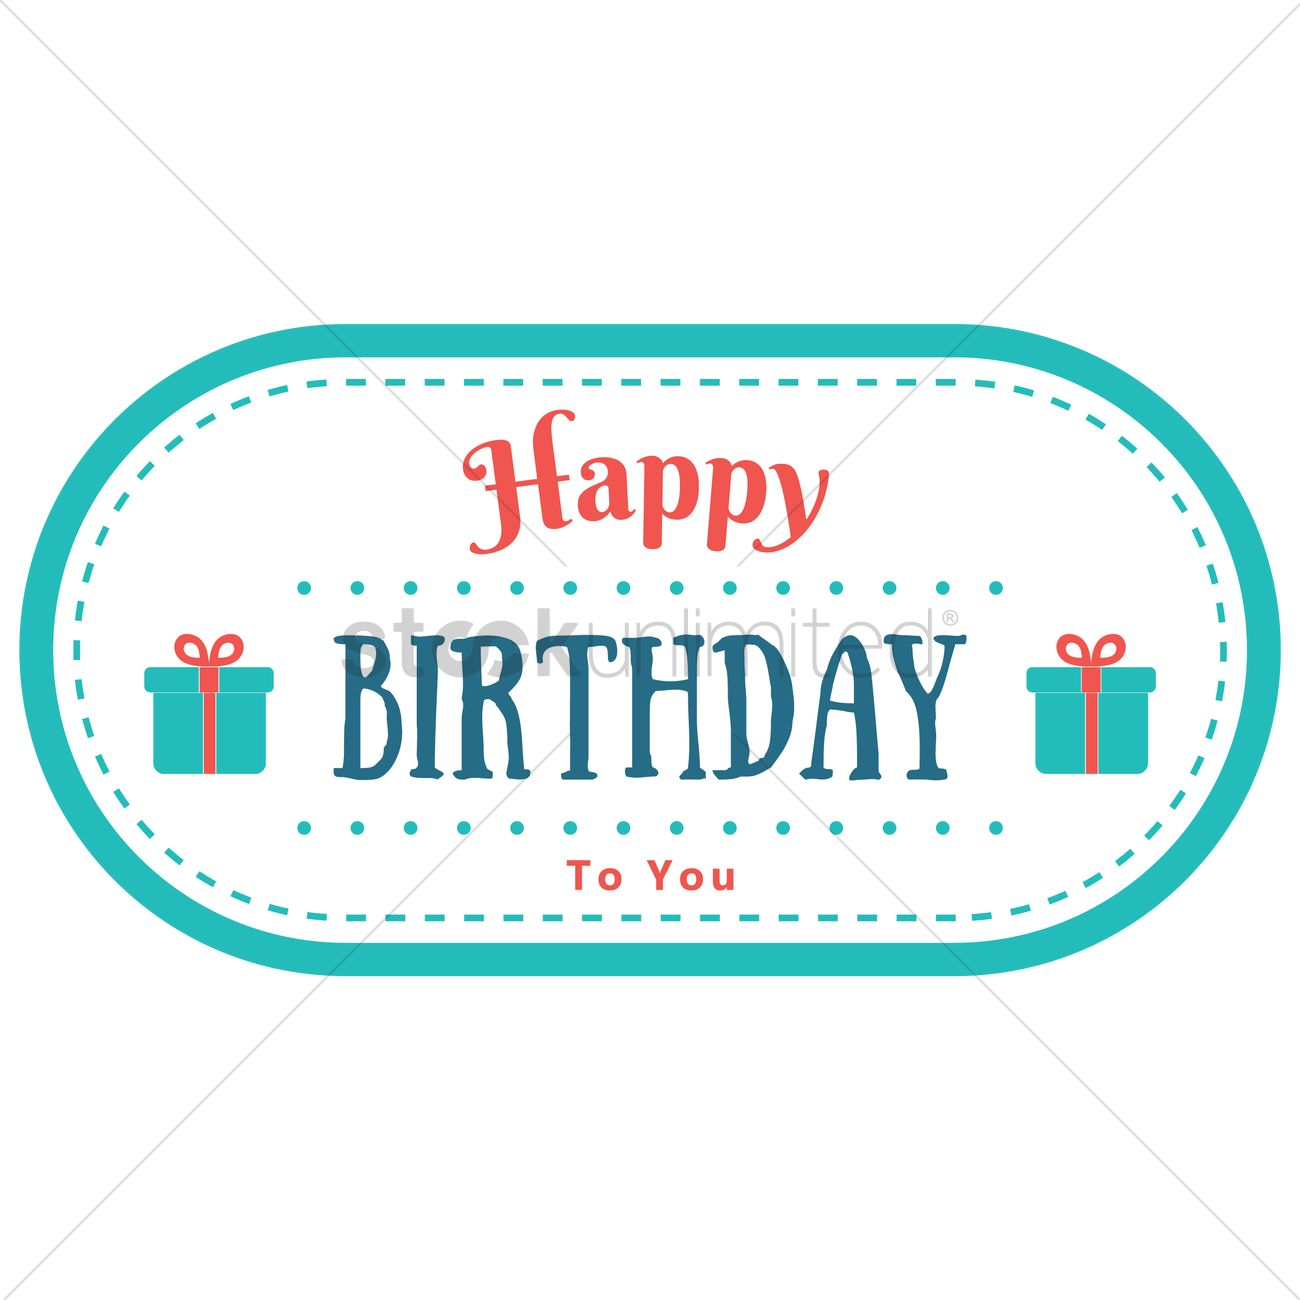 Happy birthday label design Vector Image - 1799688 | StockUnlimited